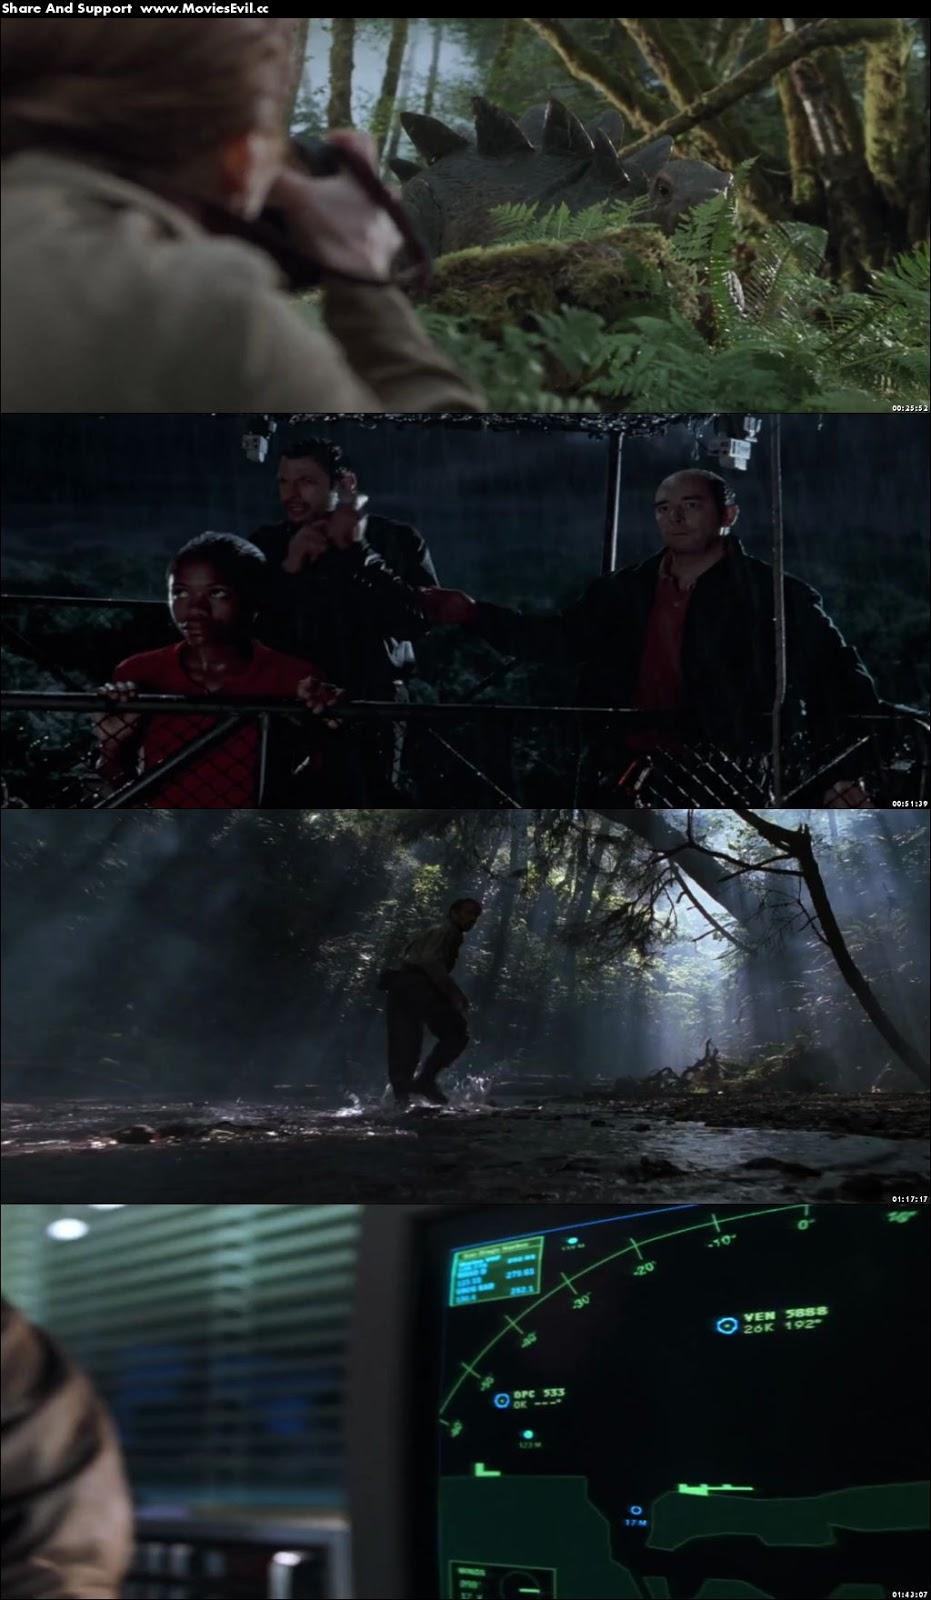 Jurassic Park II The Lost World 1997  full movie dopwnload,Jurassic Park II The Lost World 1997 hindi dubbed download,Jurassic Park II The Lost World 1997 300 mb download